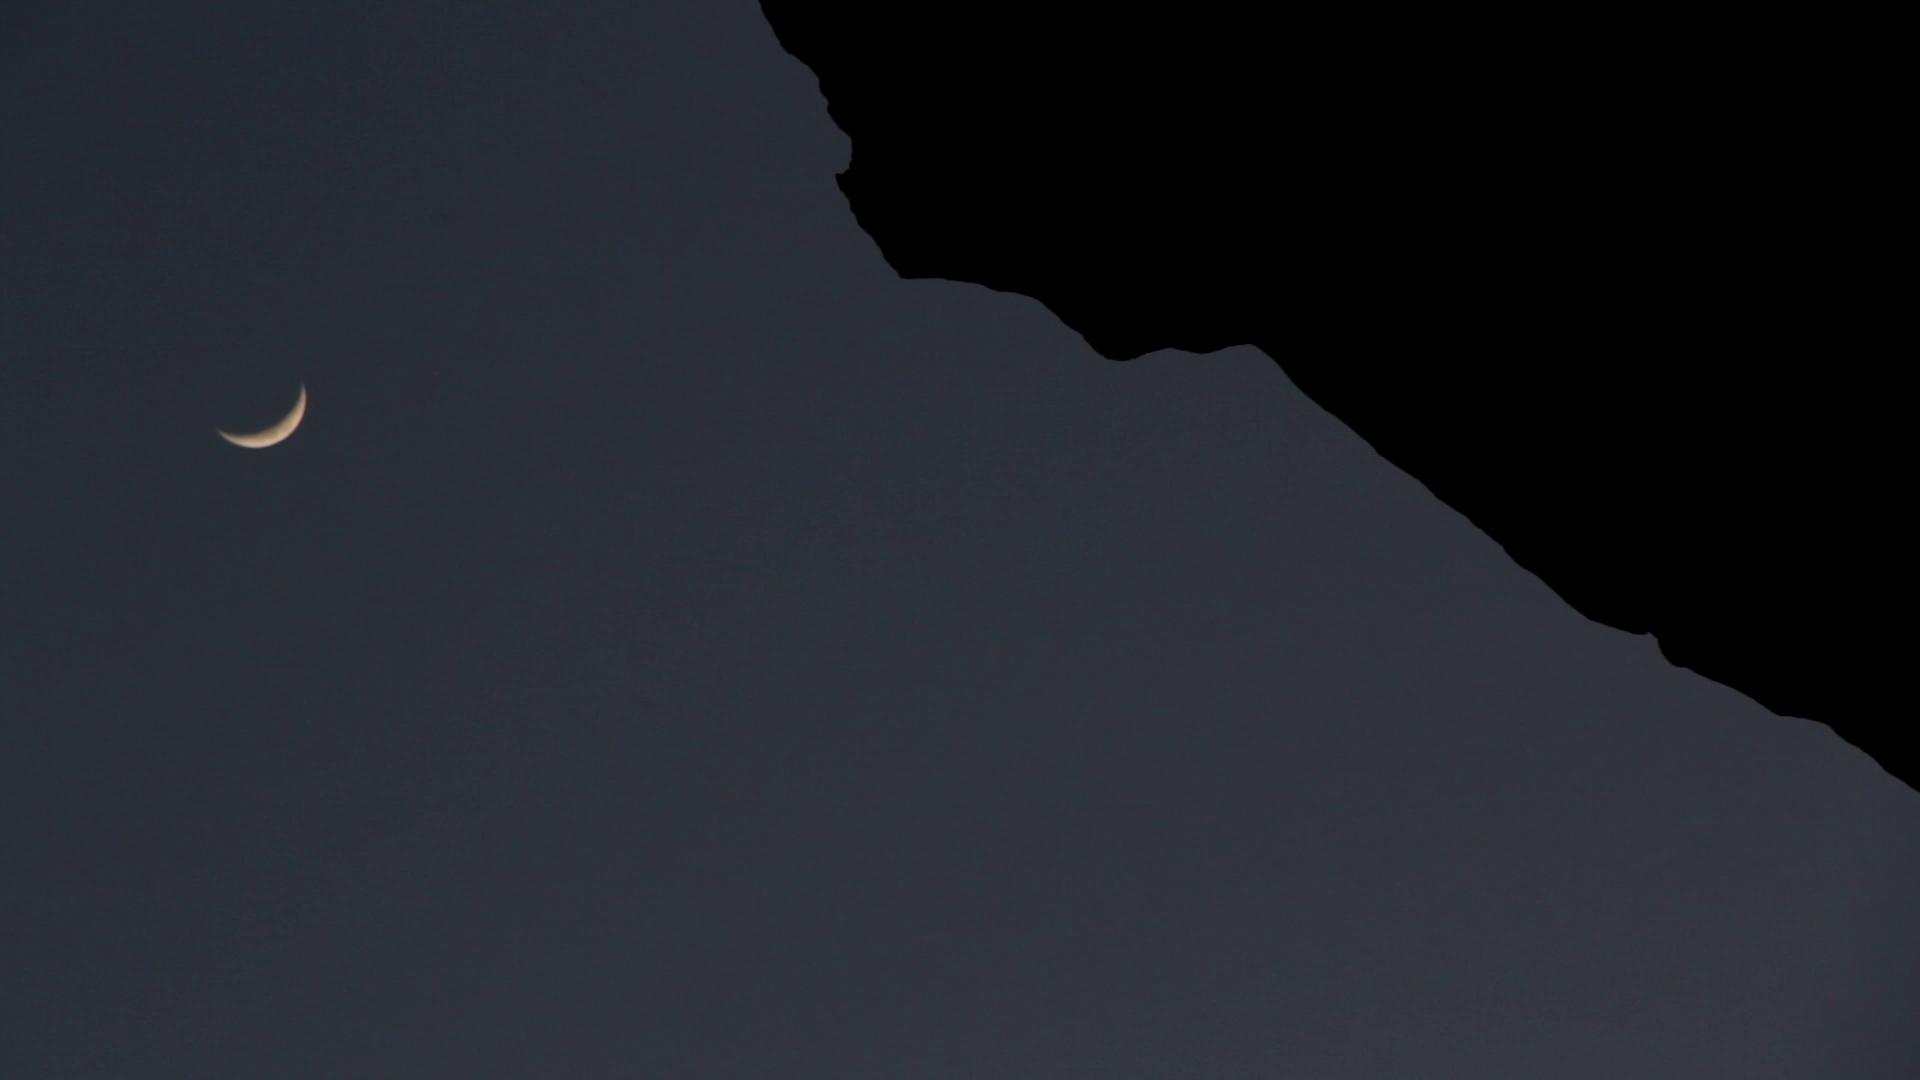 noche bandiagara mali pablocaminante - Malí 7, País Dogon IV: Tellem